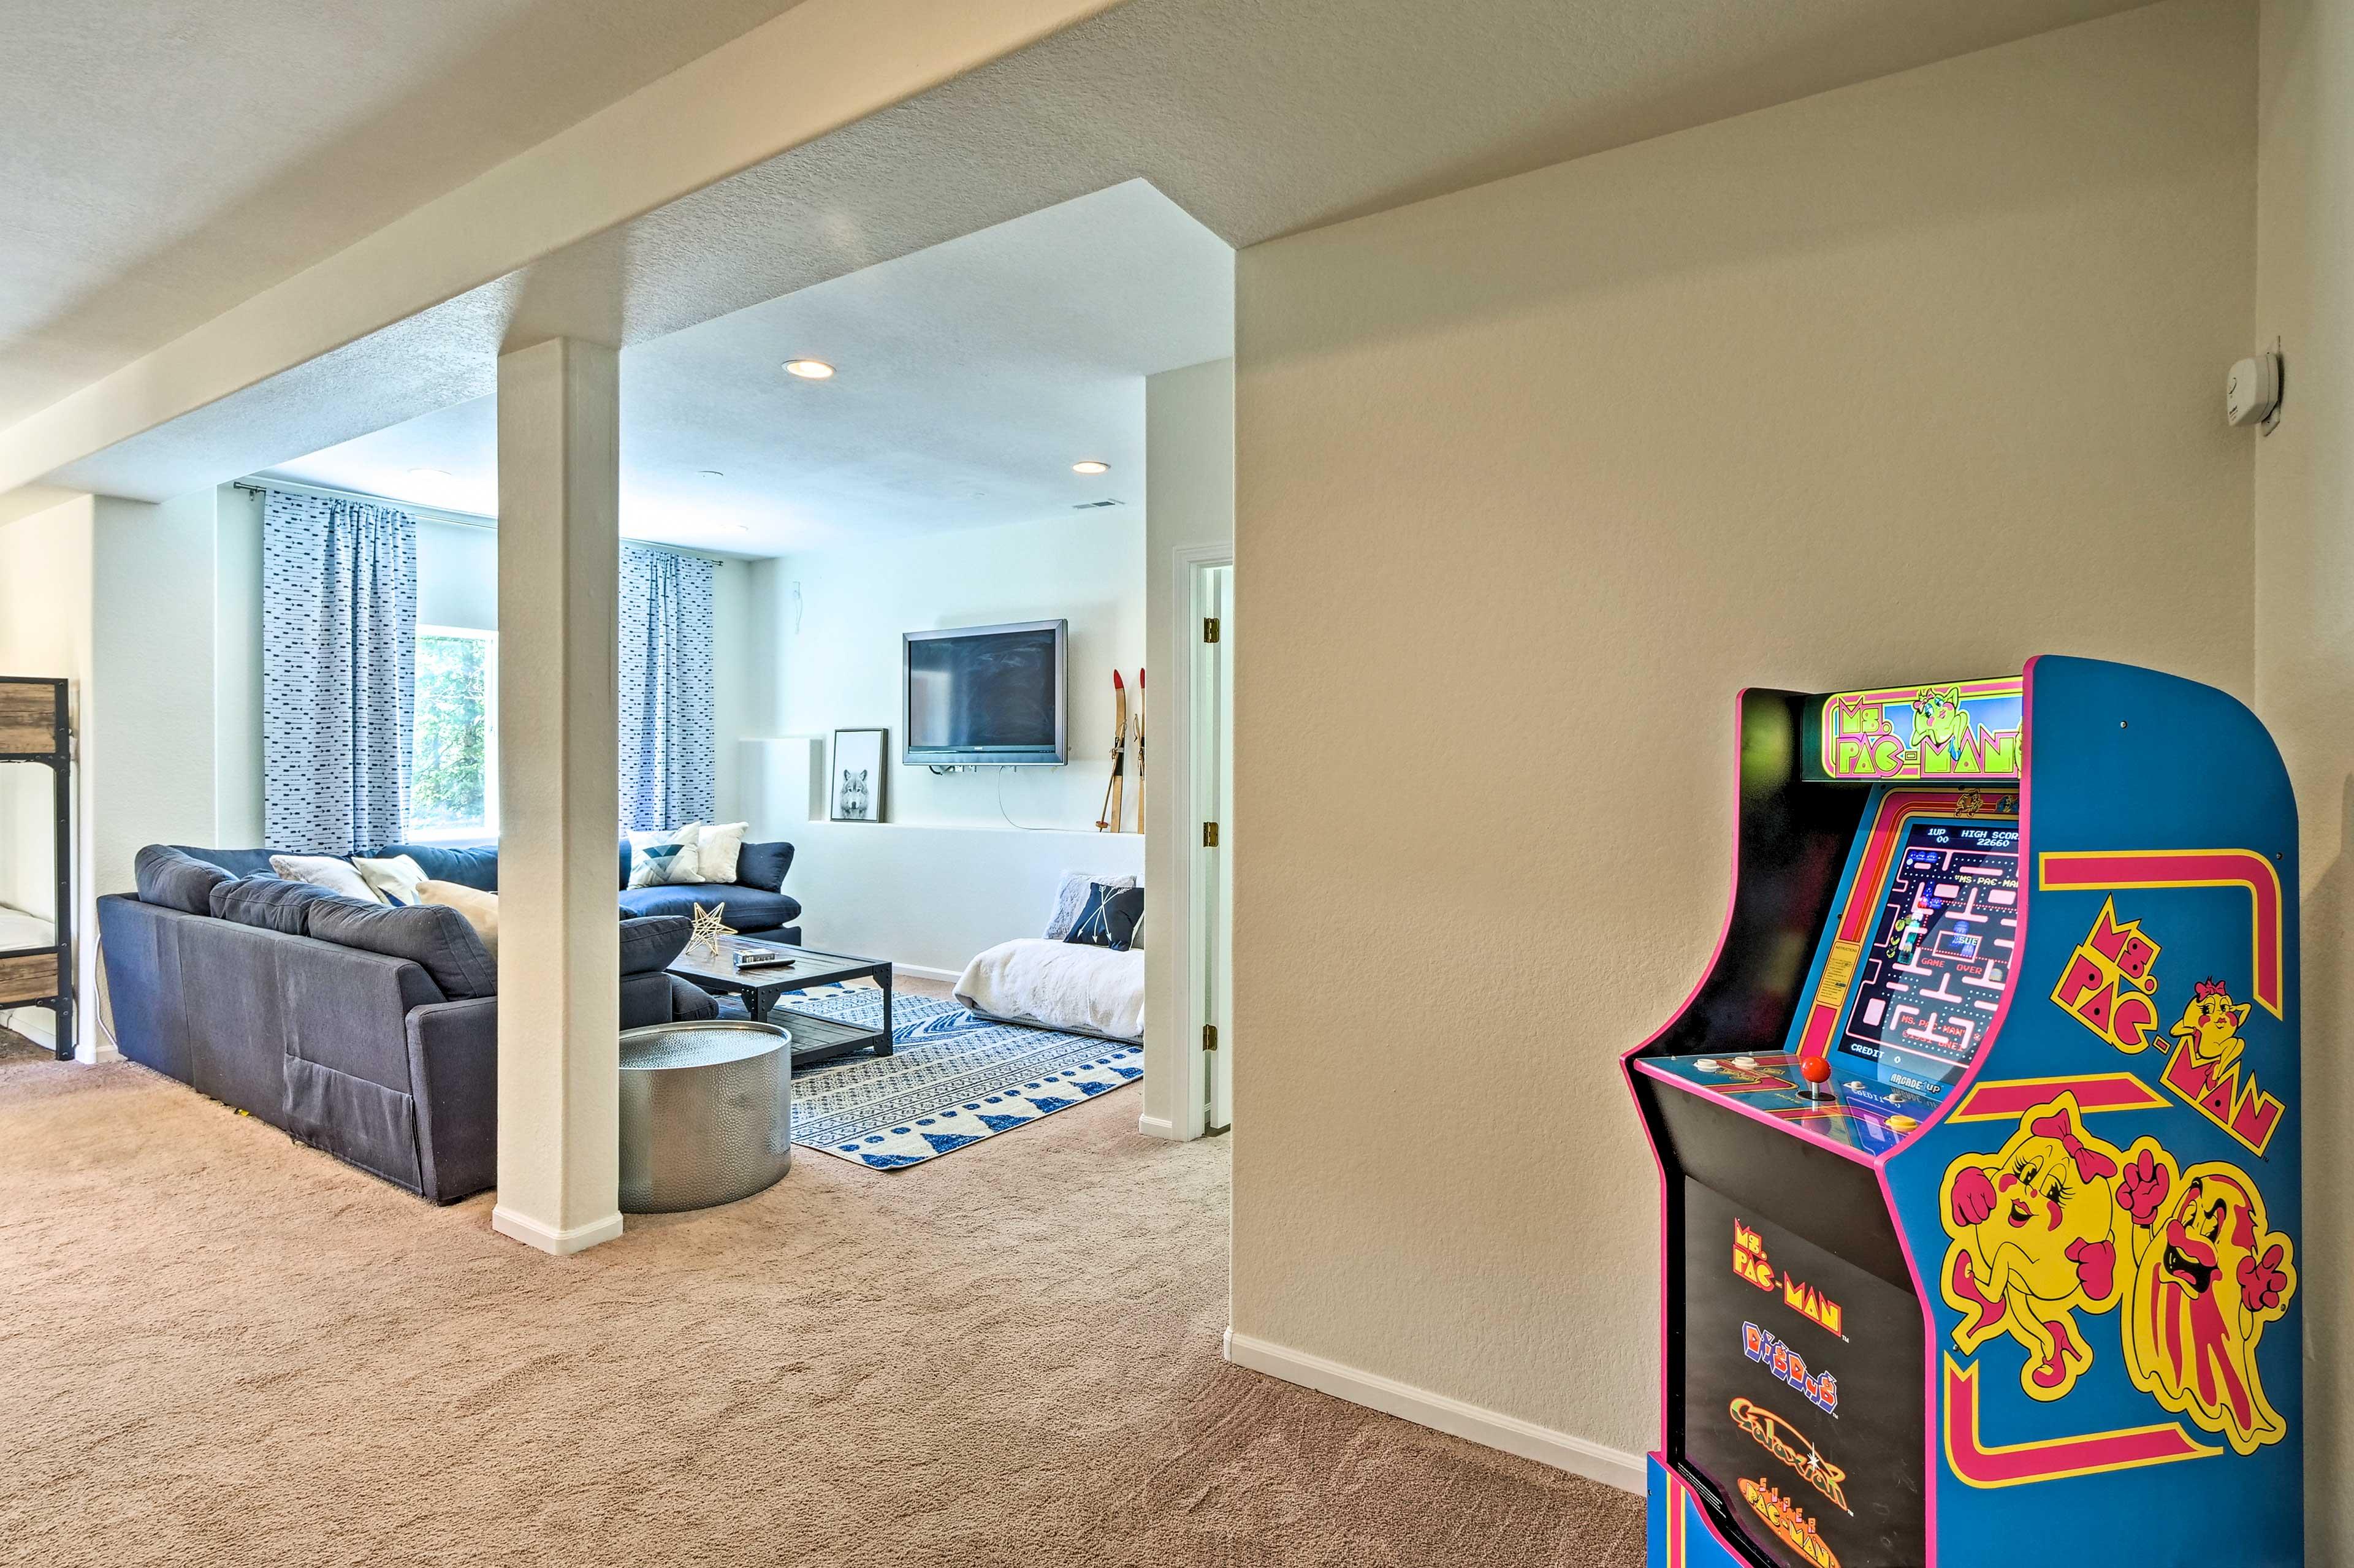 Lower-Level Living Room   Ms. Pac Man Arcade Machine